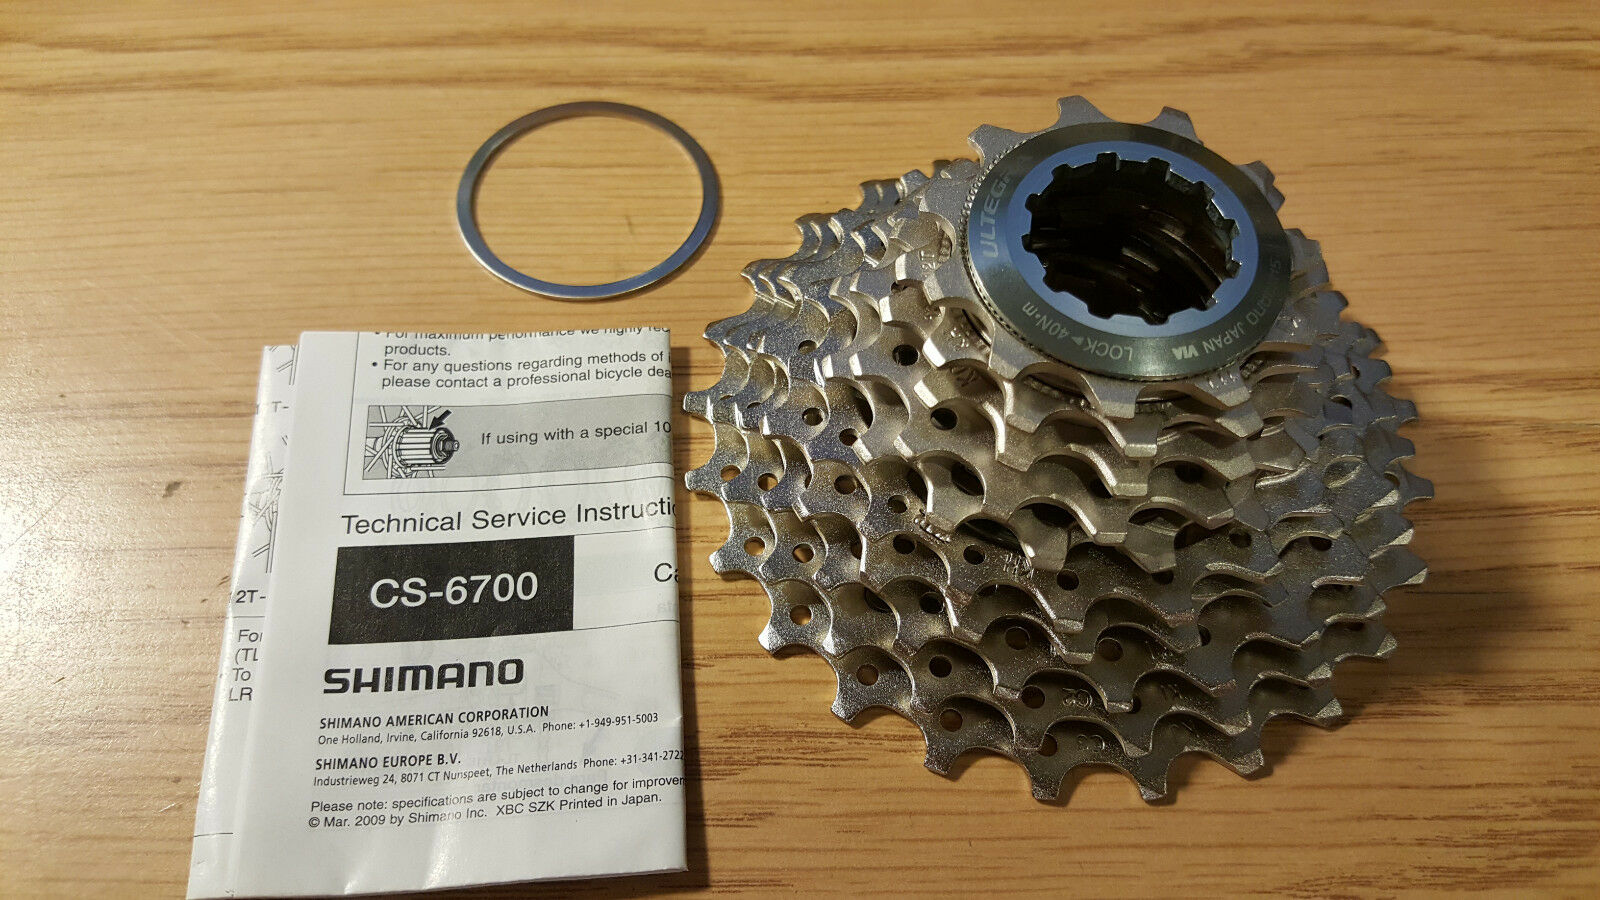 Shimano Ultegra CS-6700 10-Speed Bicycle Road Bike Cassette gravel cross 11-25T